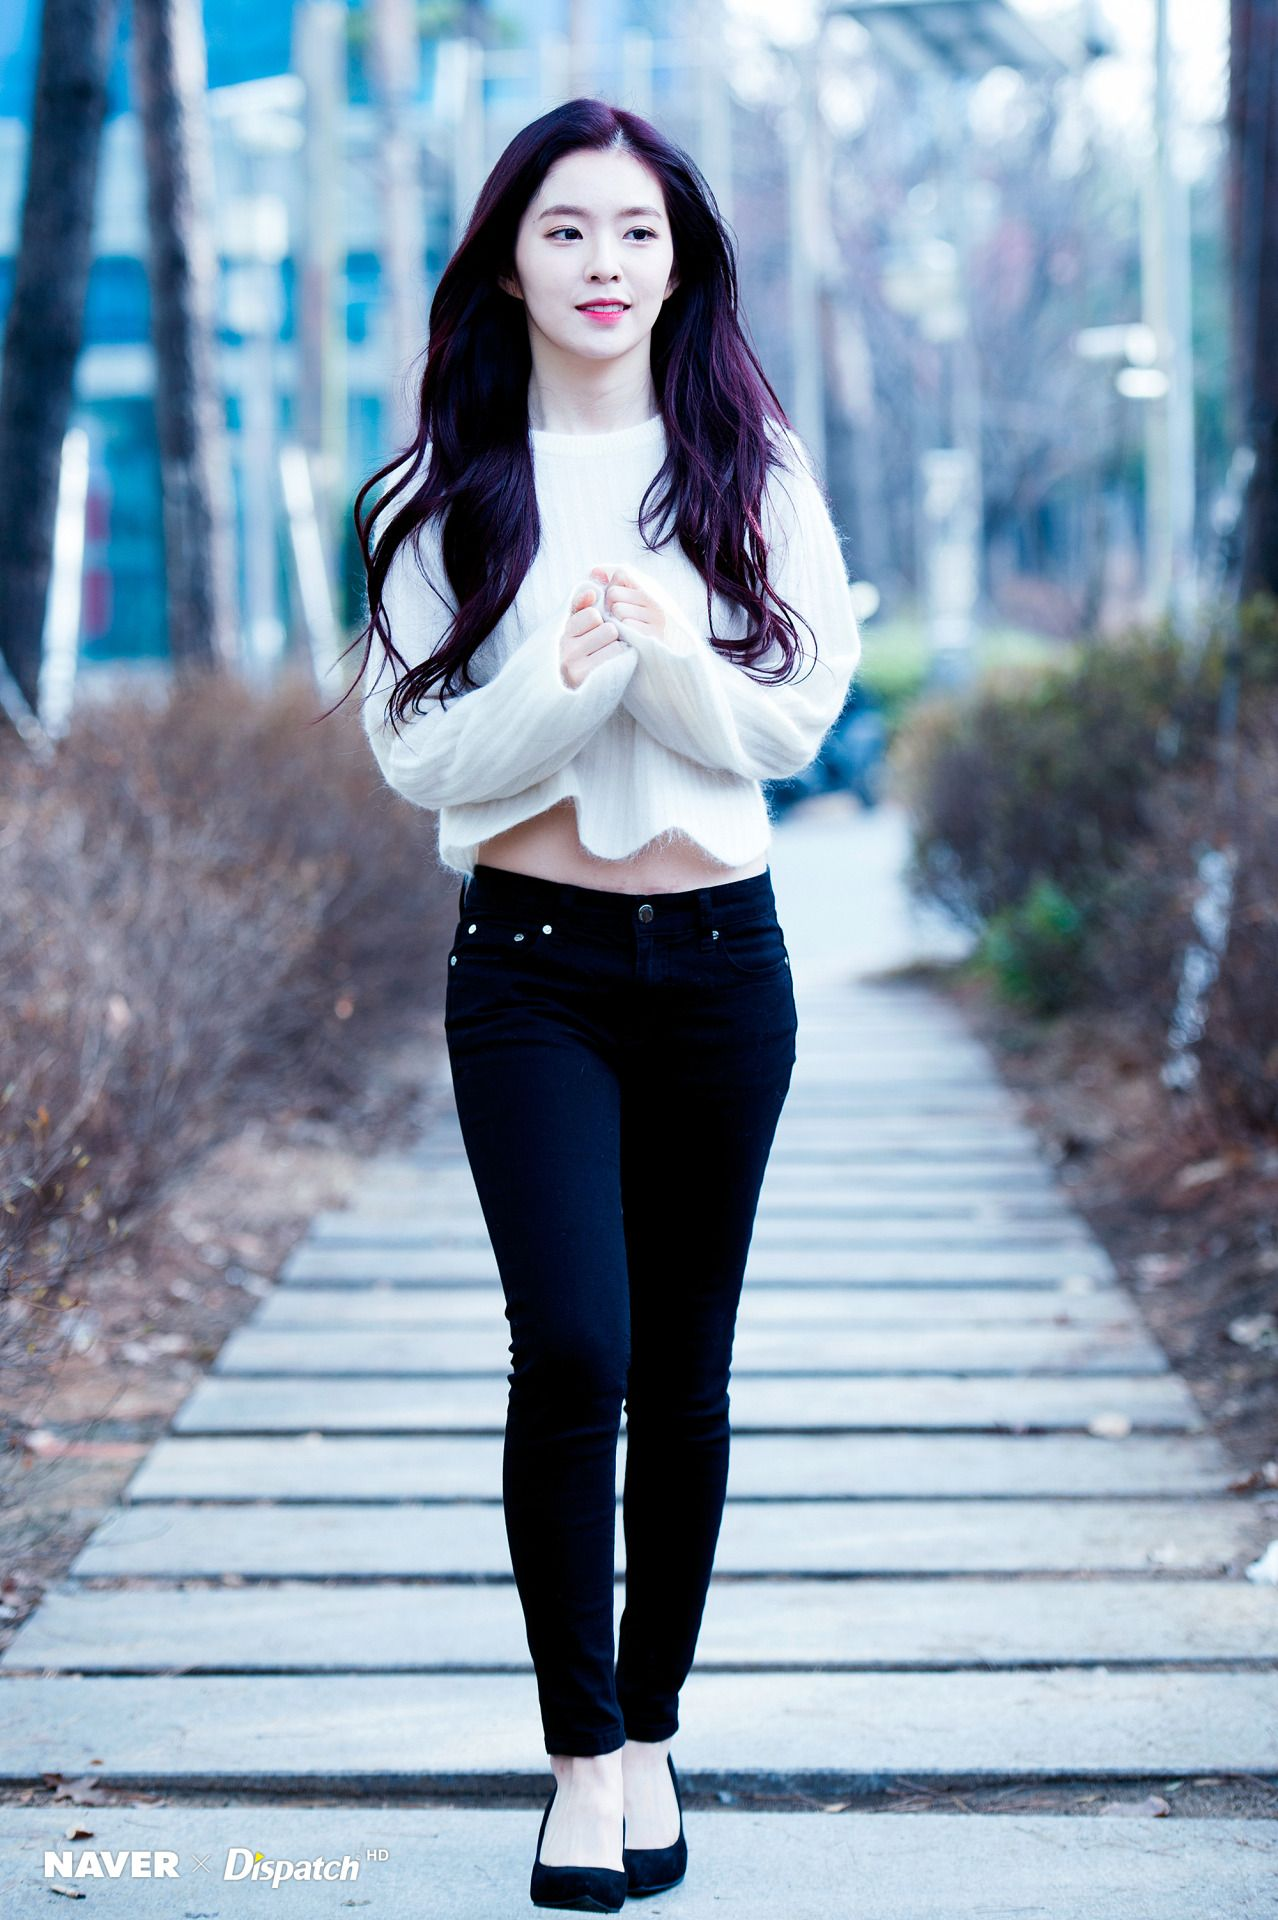 RED VELVET - Irene 아이린 (Bae JuHyun 배주현) #배추 #baechu